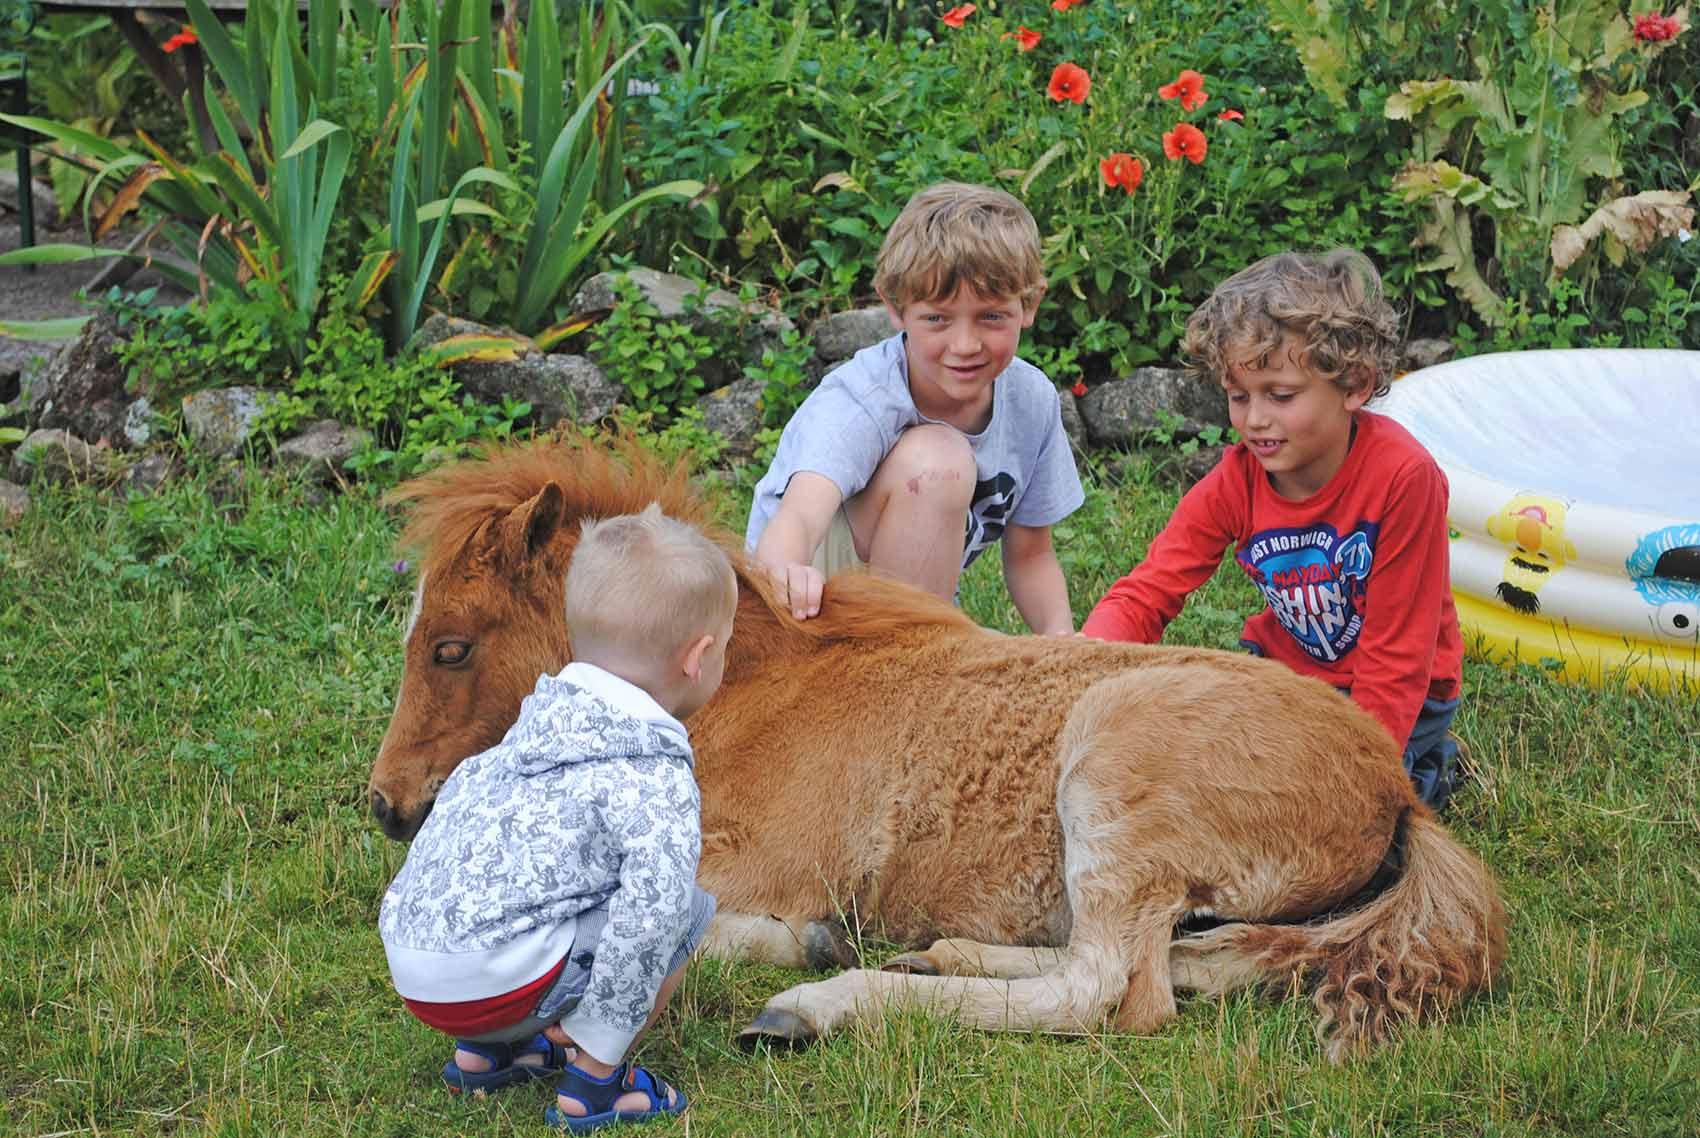 Kinderparadijs, jongetjes met veulen, Brénazet, Allier, Auvergne